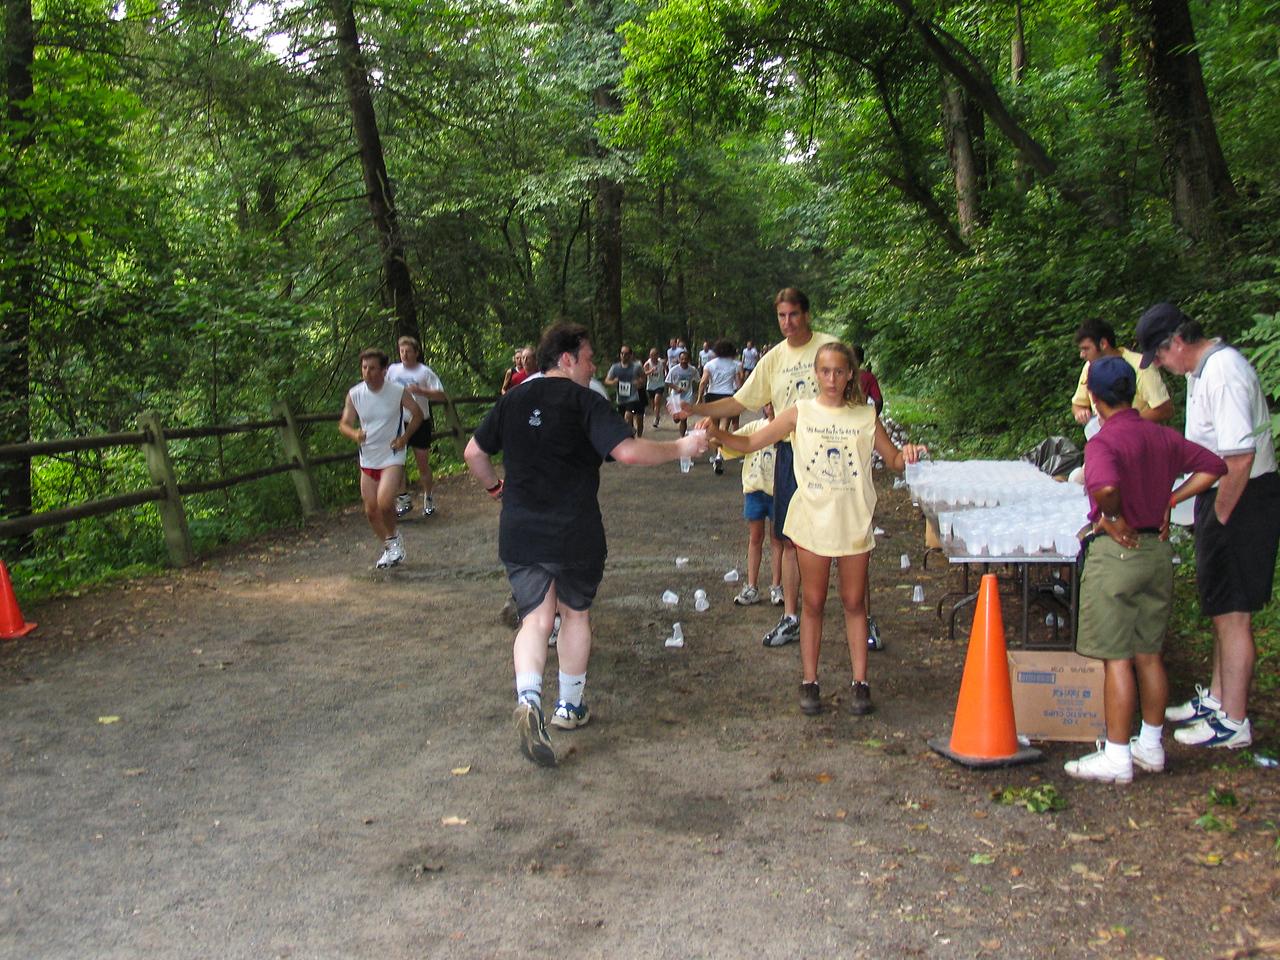 Daniel Walsh rehydrating - Fairmont Park in Chestnut Hill - July 2005